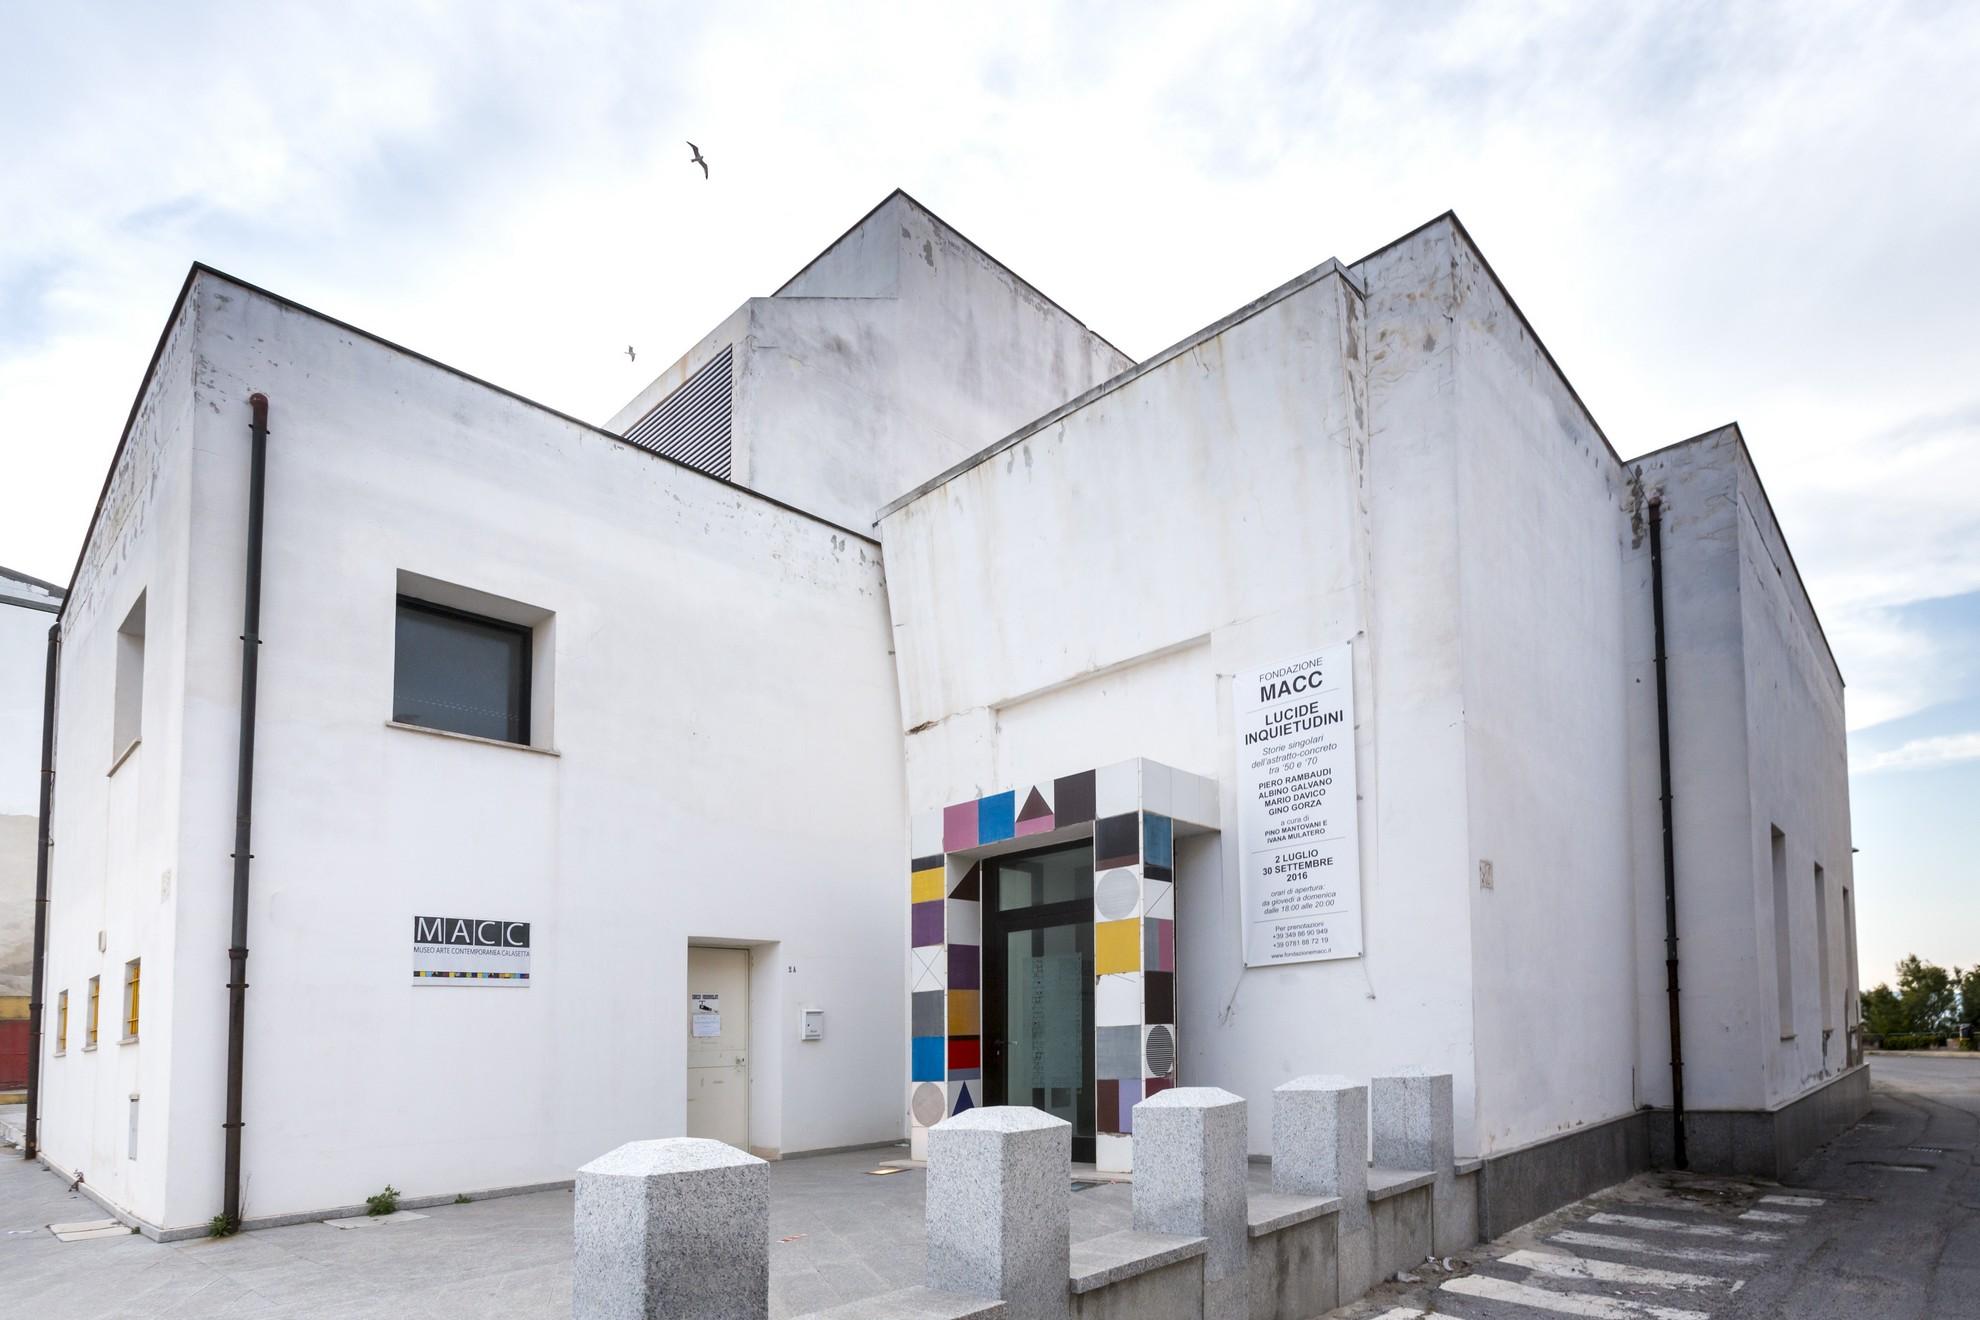 MACC Museo di Arte Contemporanea